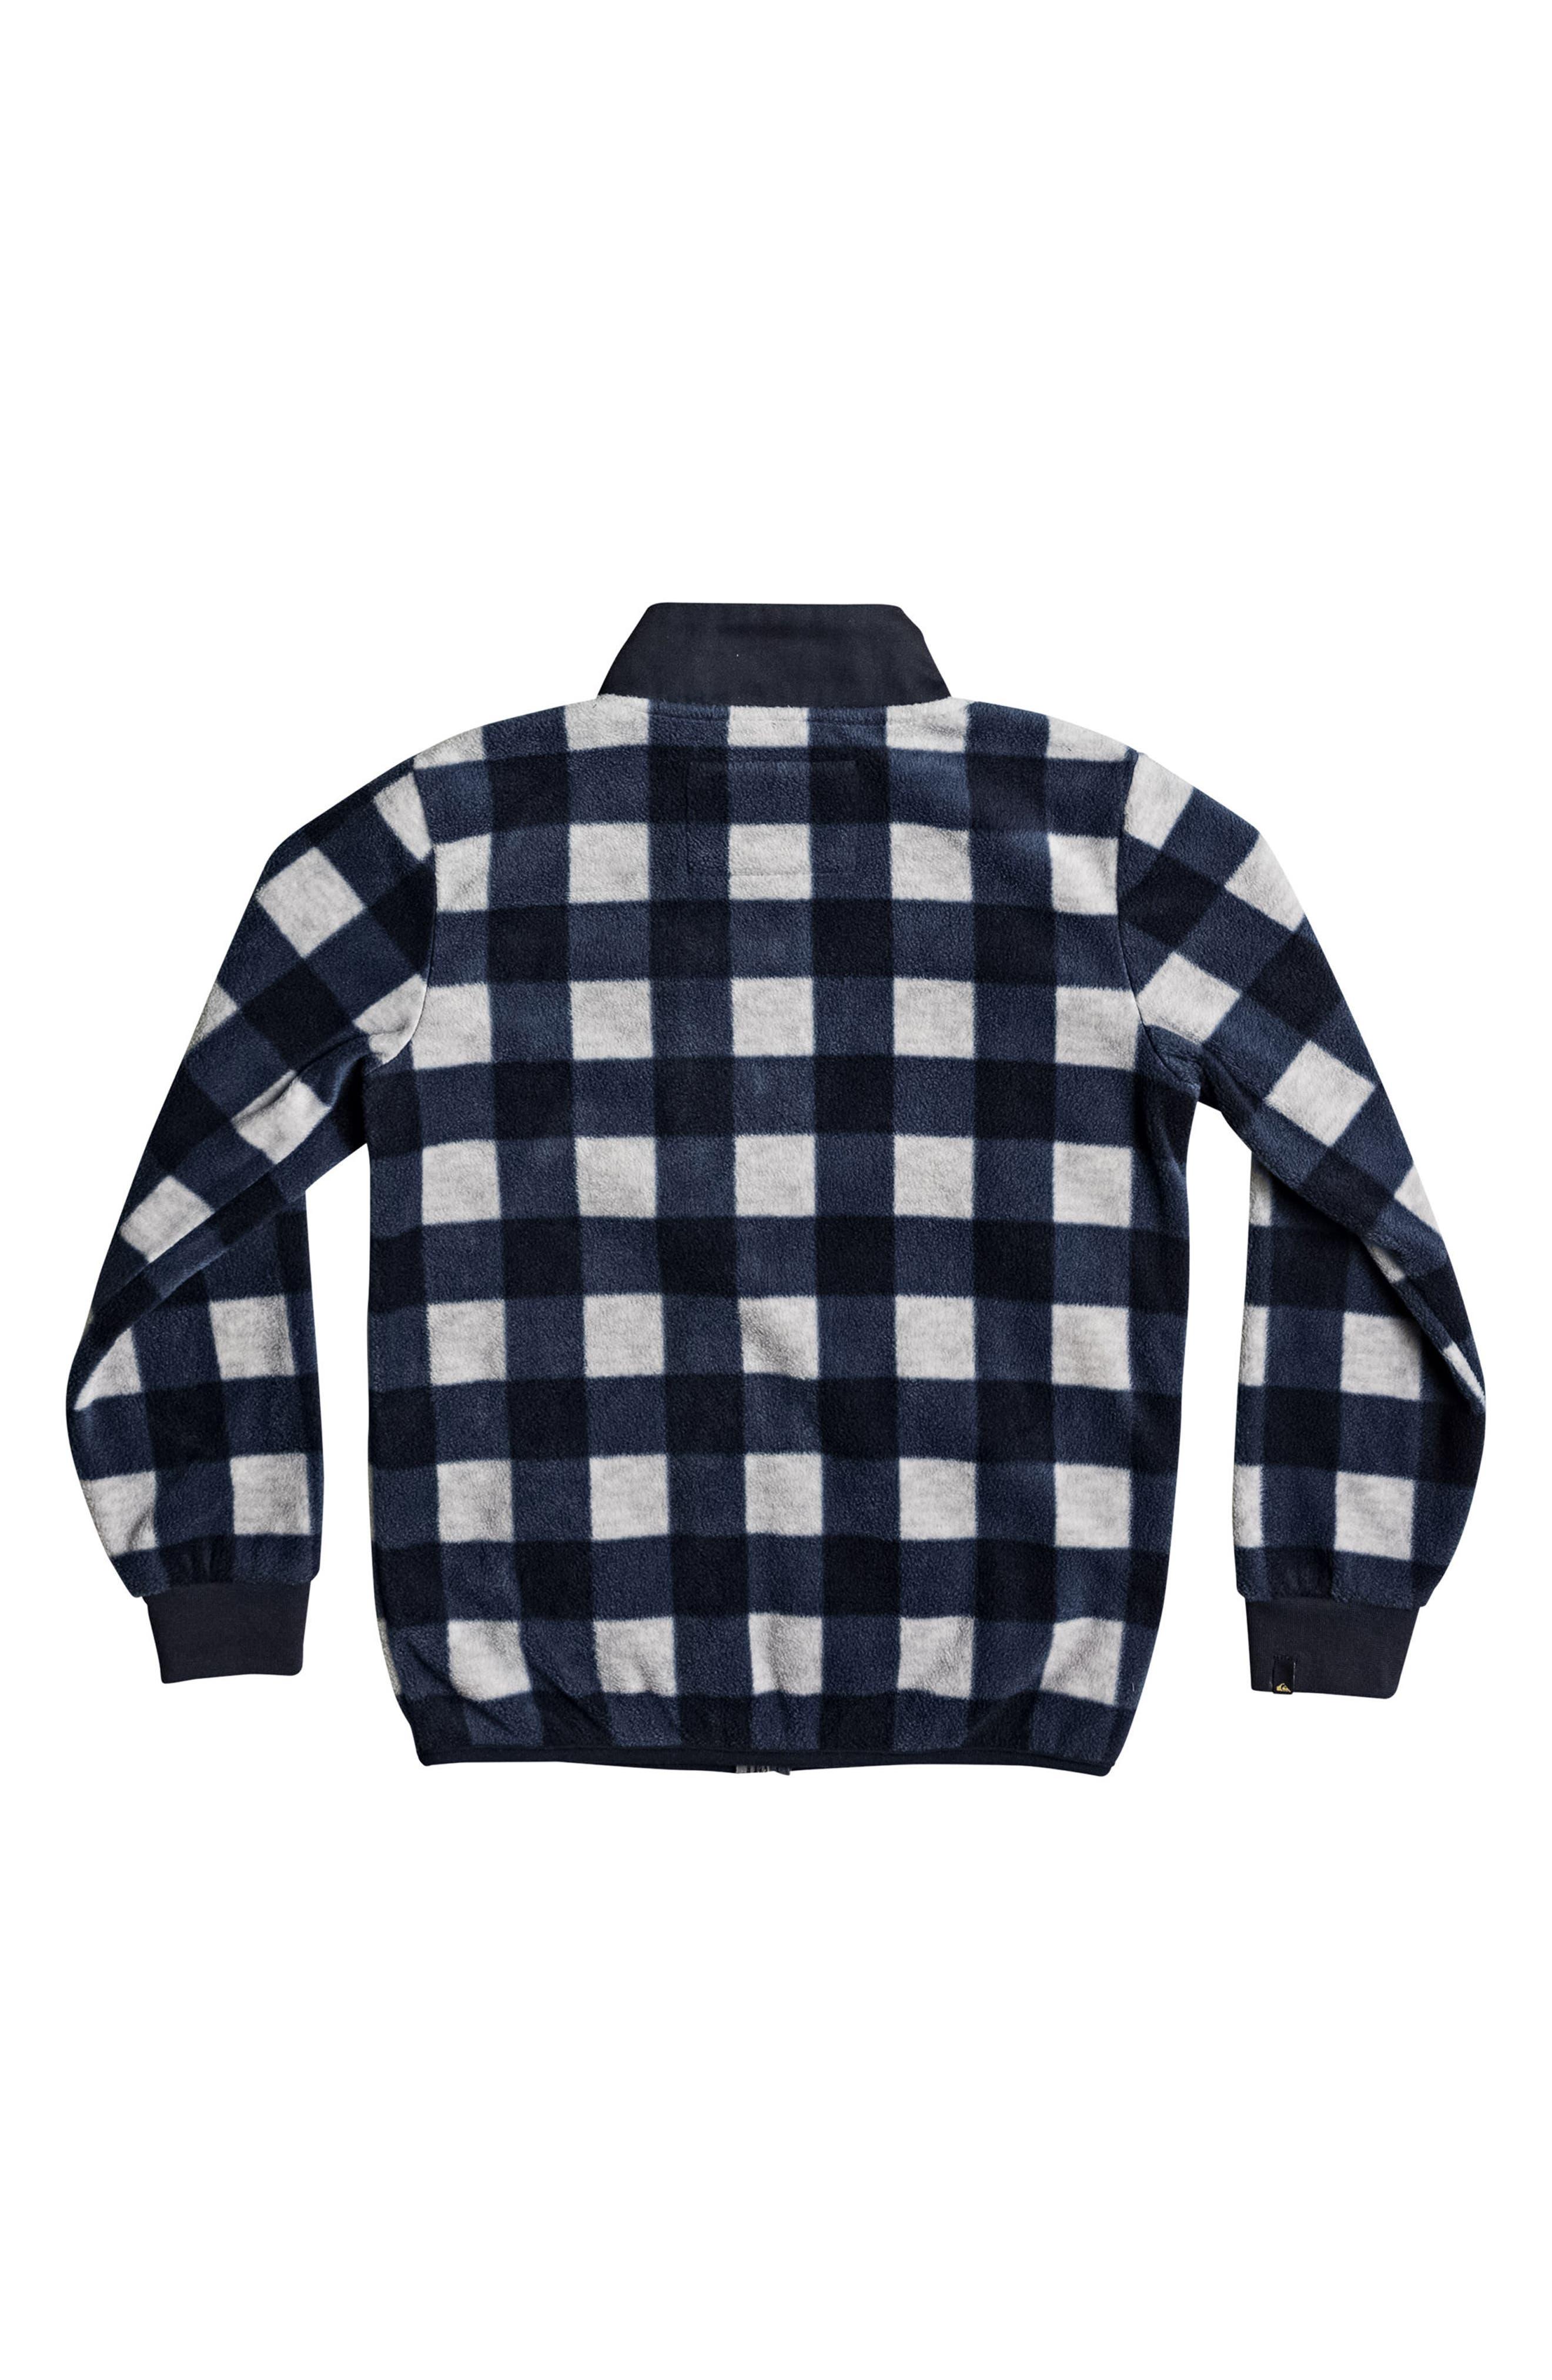 Turbo Speed Buffalo Check Fleece Jacket,                             Alternate thumbnail 2, color,                             Navy Blazer